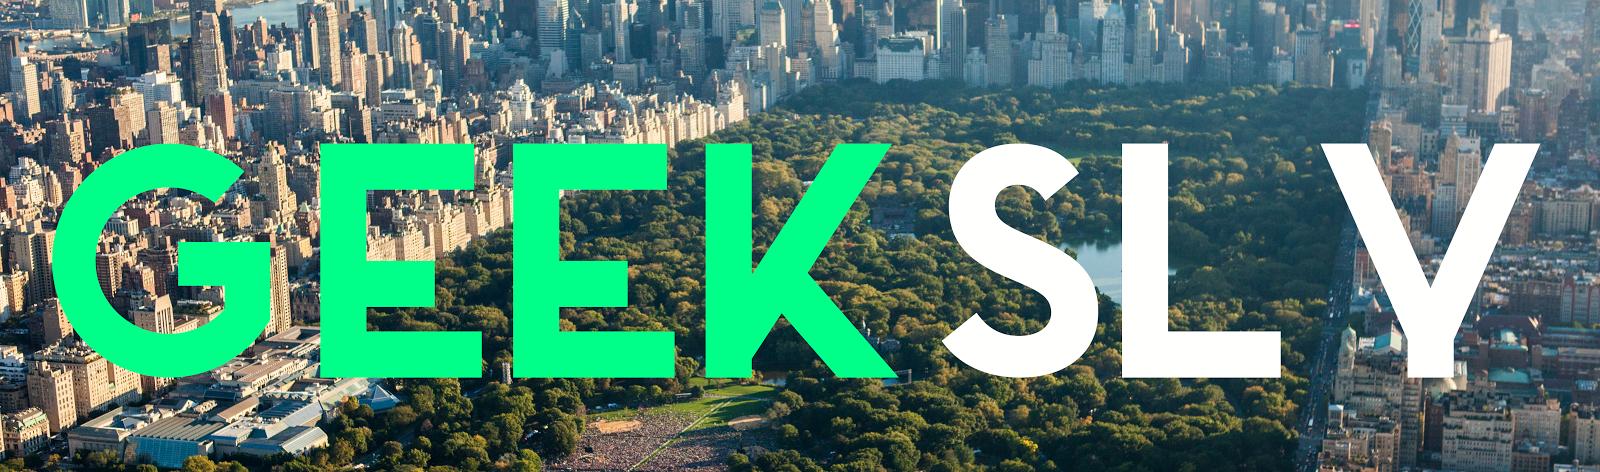 GeekSly - Um Cara Tímido e Geek